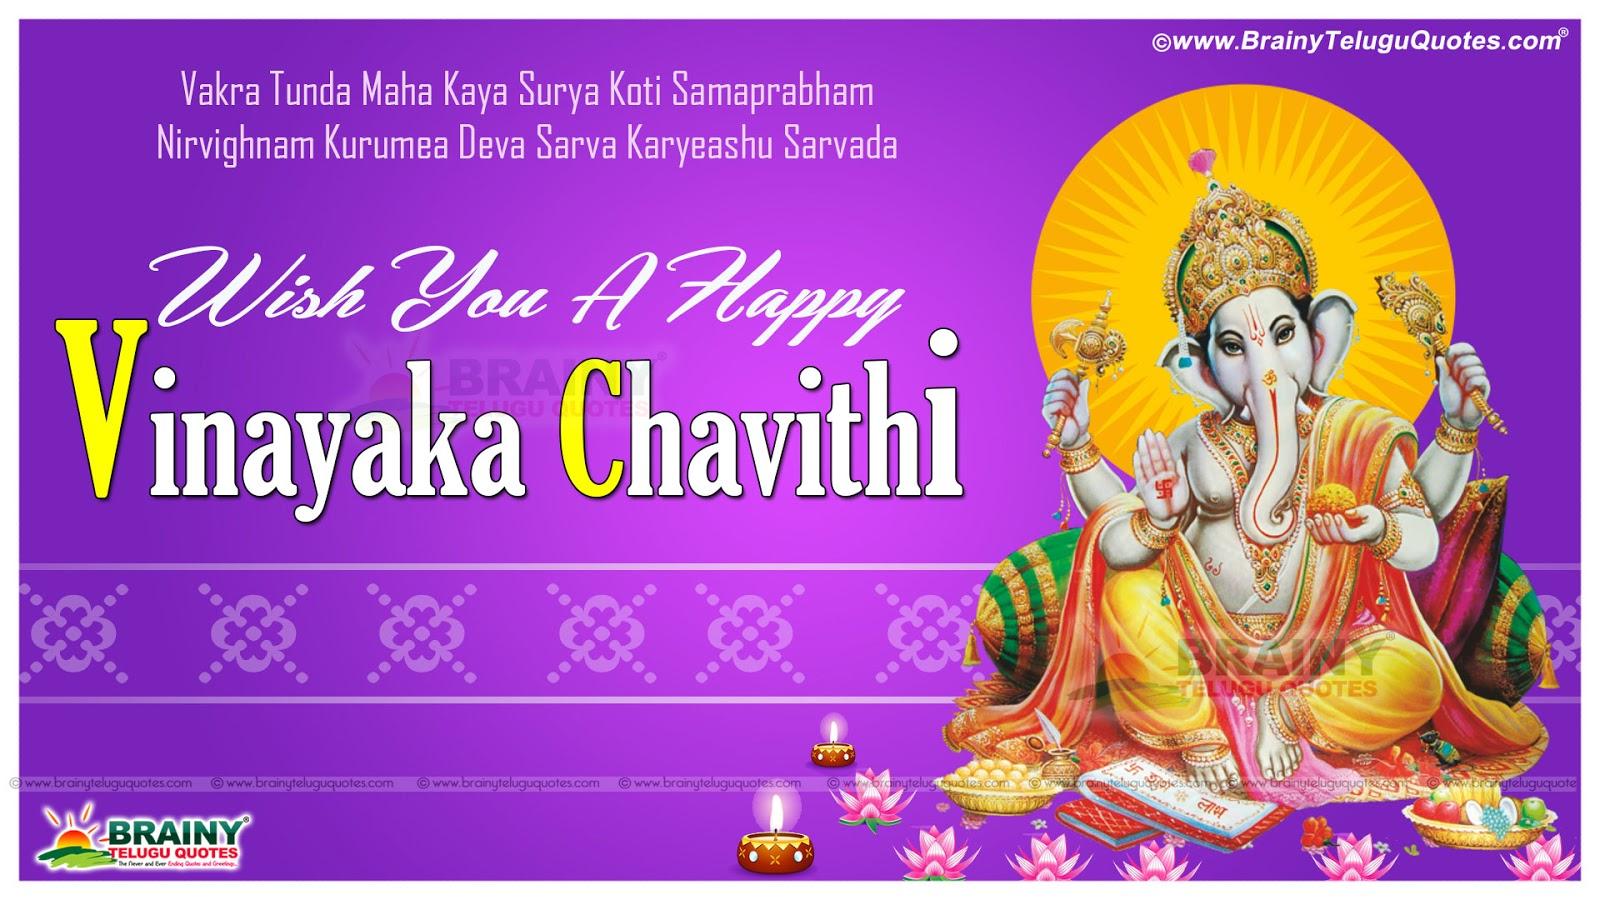 Ganesh chaturthi advance wishes greeting photo ecards advance happy vinayaka chavithi english greetings vinayaka2bchavithi2benglish2bwishes20162bbrainyteluguquotes vinayaka m4hsunfo Gallery